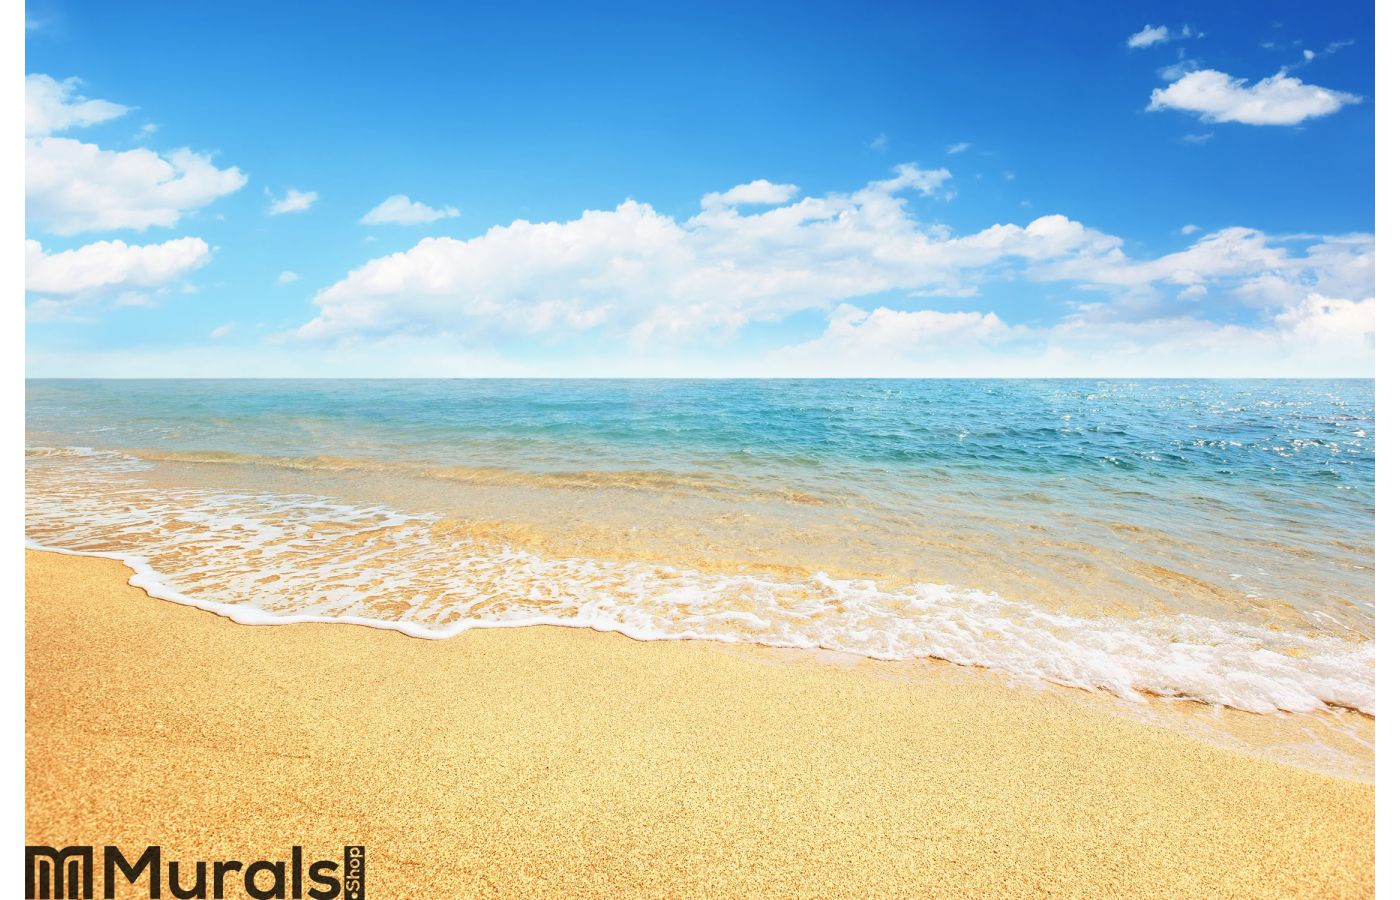 Sand Beach And Tropical Sea Wall Mural